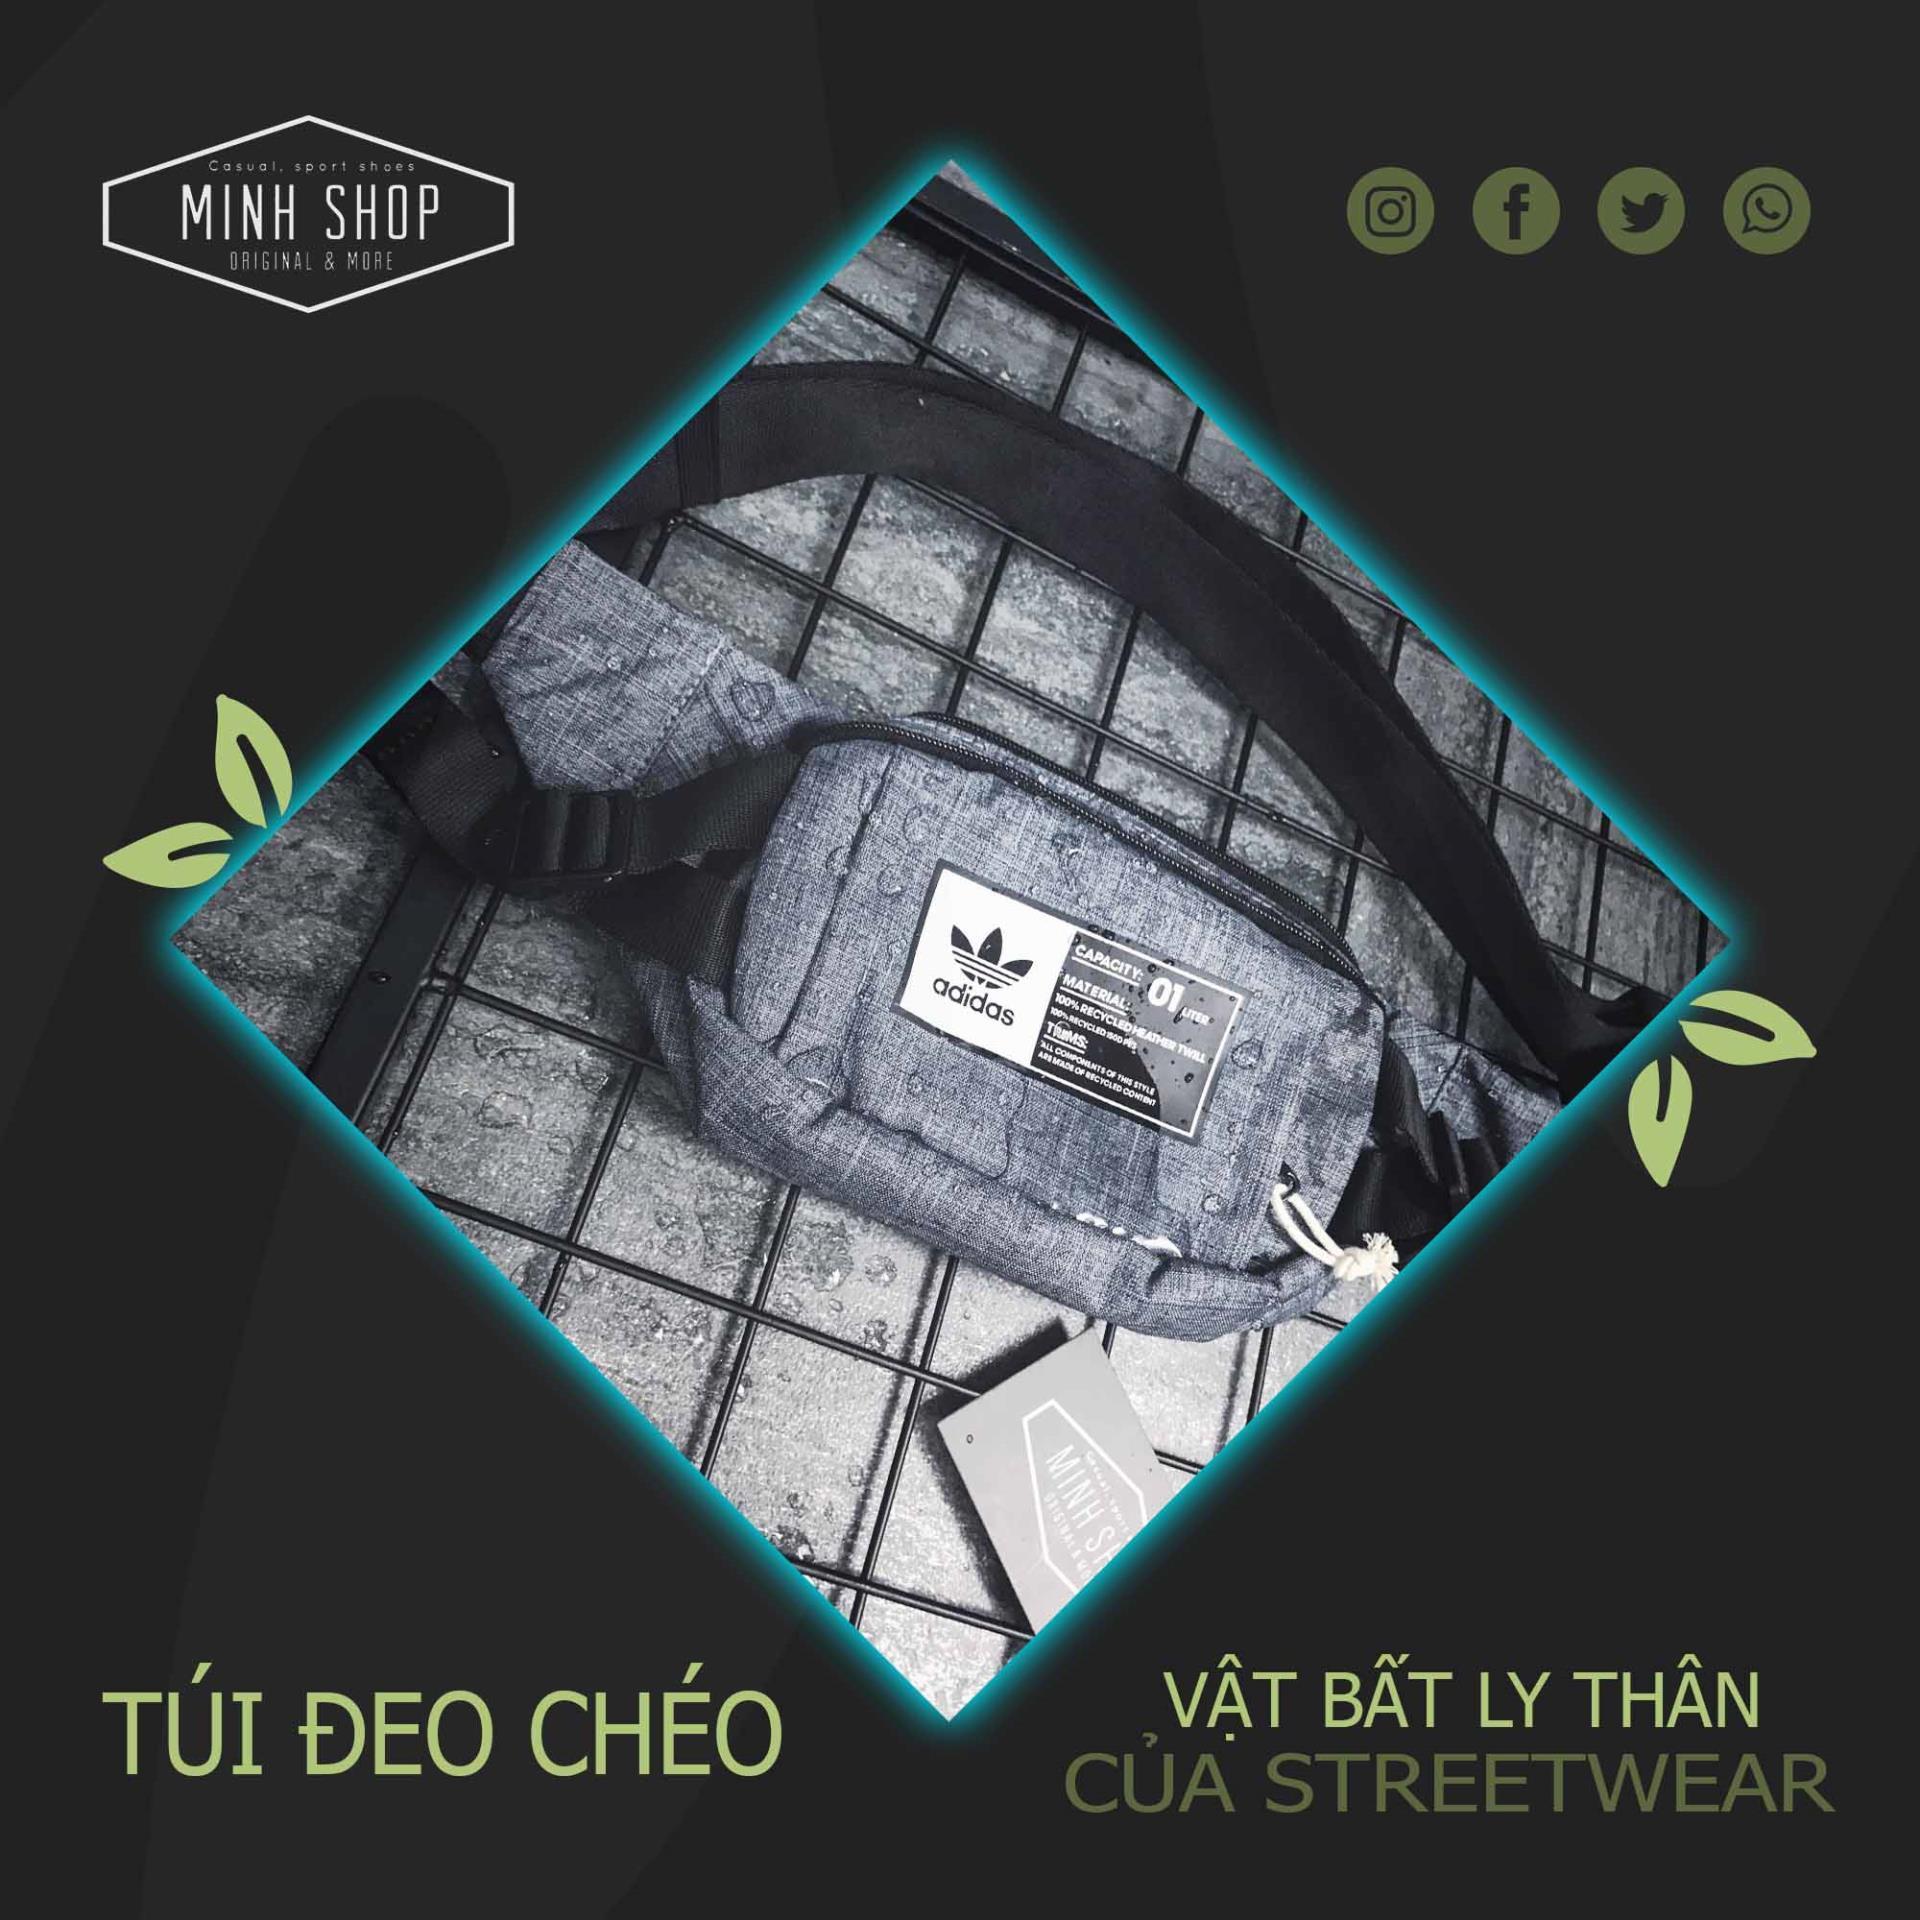 tui-deo-cheo-vat-bat-ly-than-cua-streetwear-nam-2019